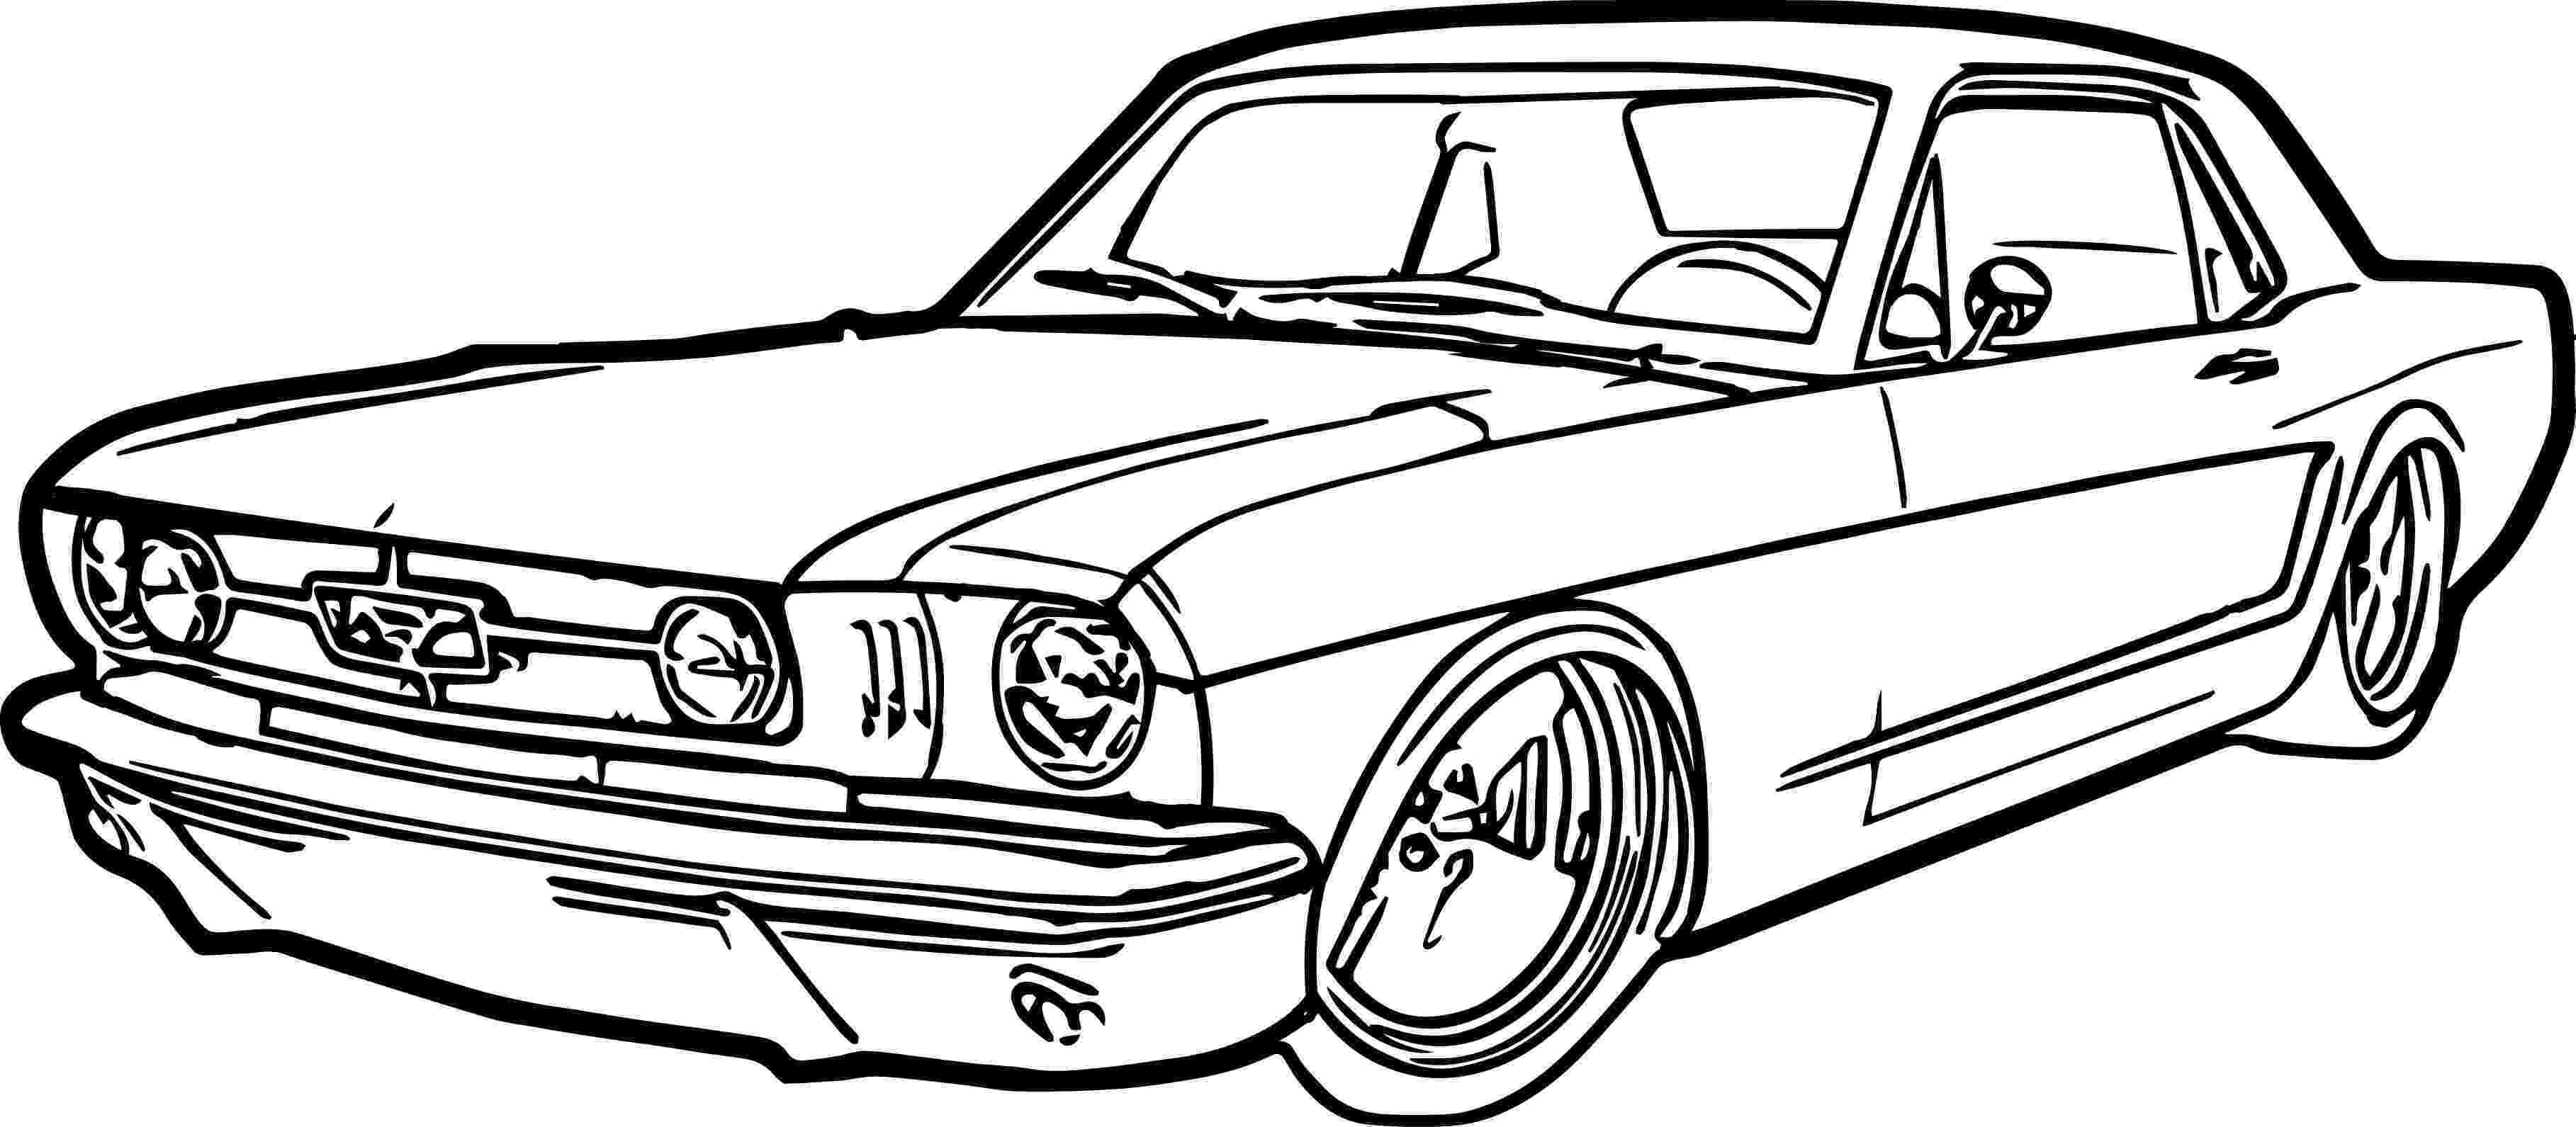 cars colouring sheets disney cars coloring pages getcoloringpagescom colouring cars sheets 1 1